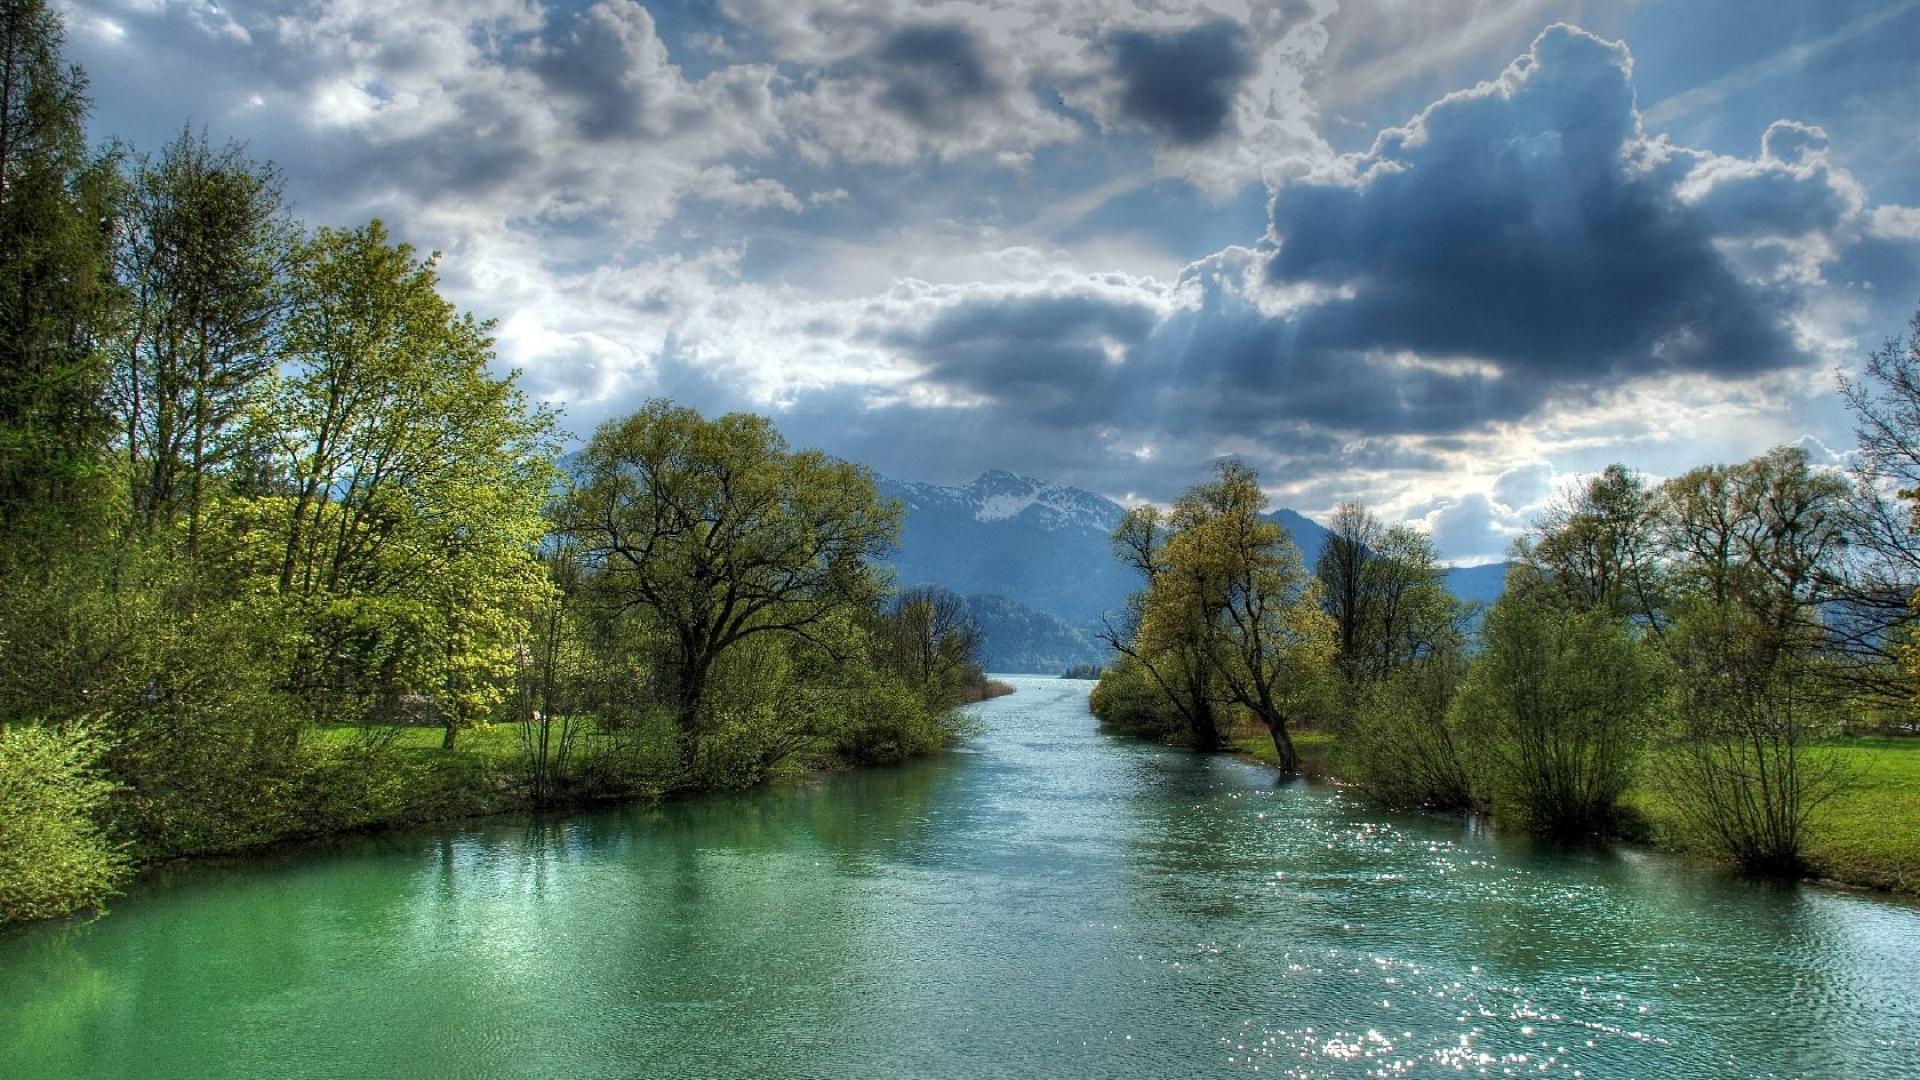 Tutorial Water   Wallpaper Engine Wiki   FANDOM powered by ...